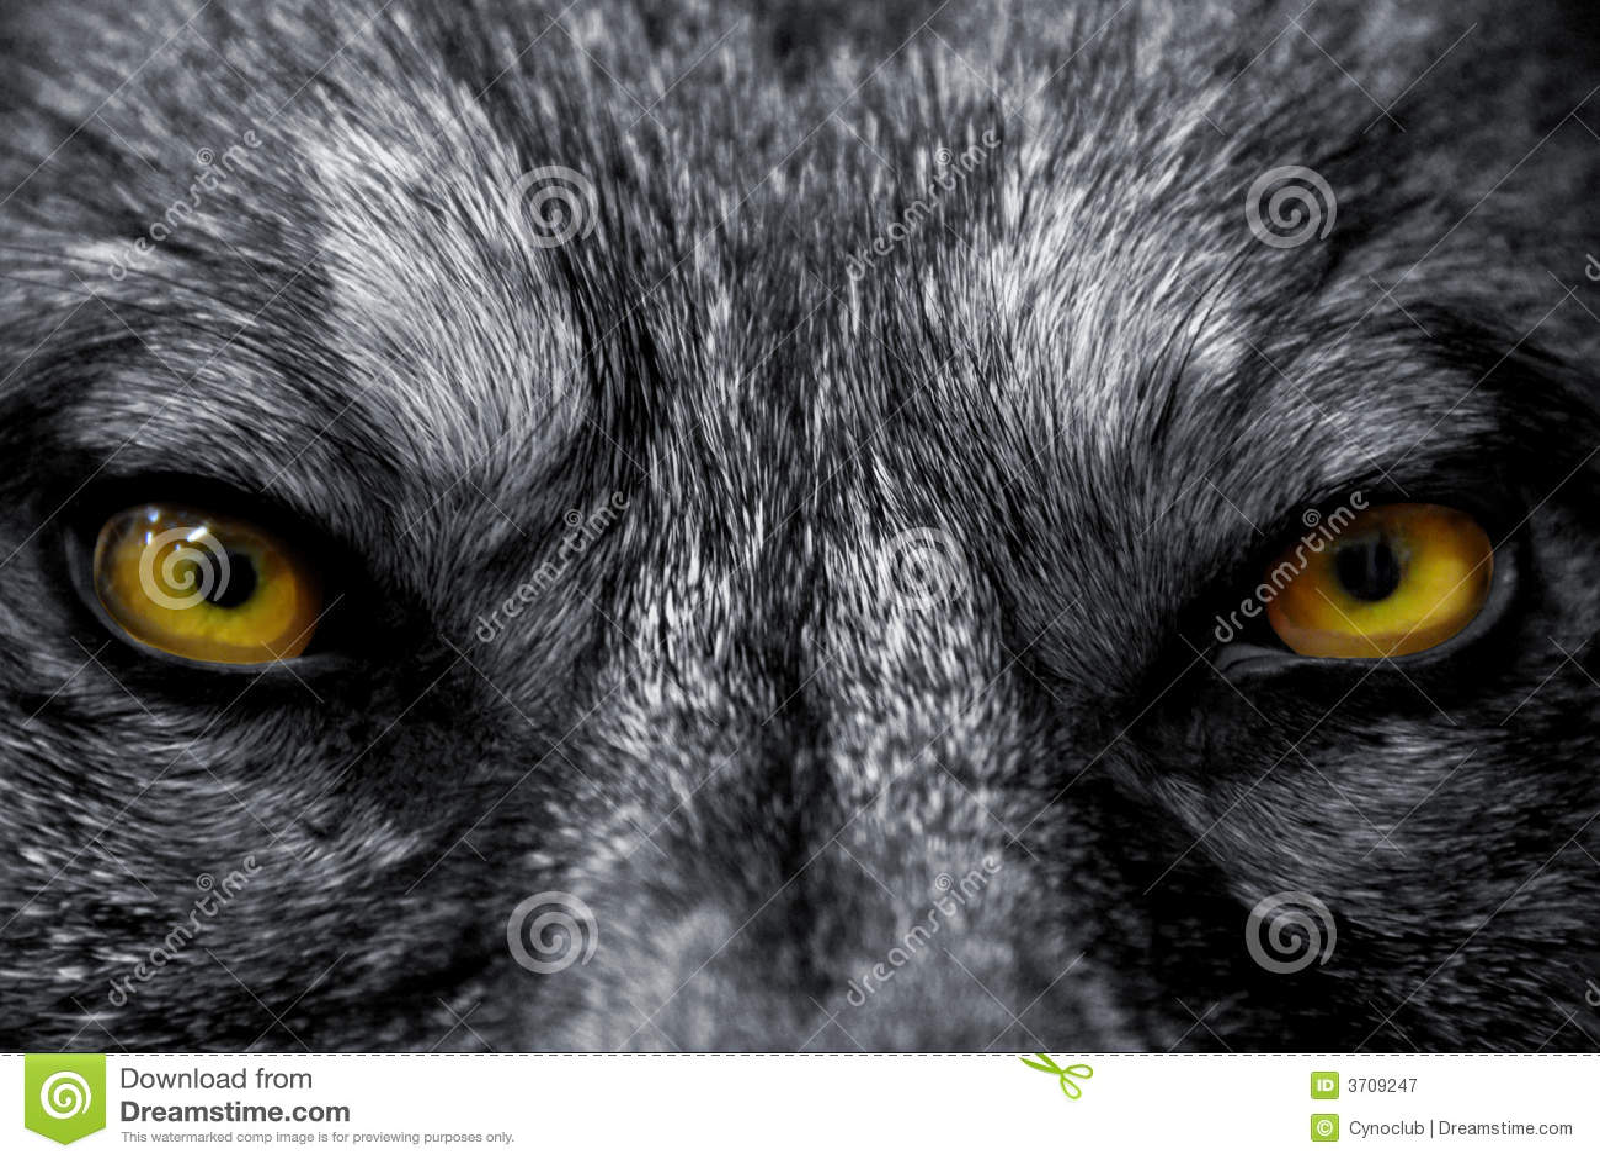 Eyes Of Wolf Royalty Free Stock Photography Image 3709247